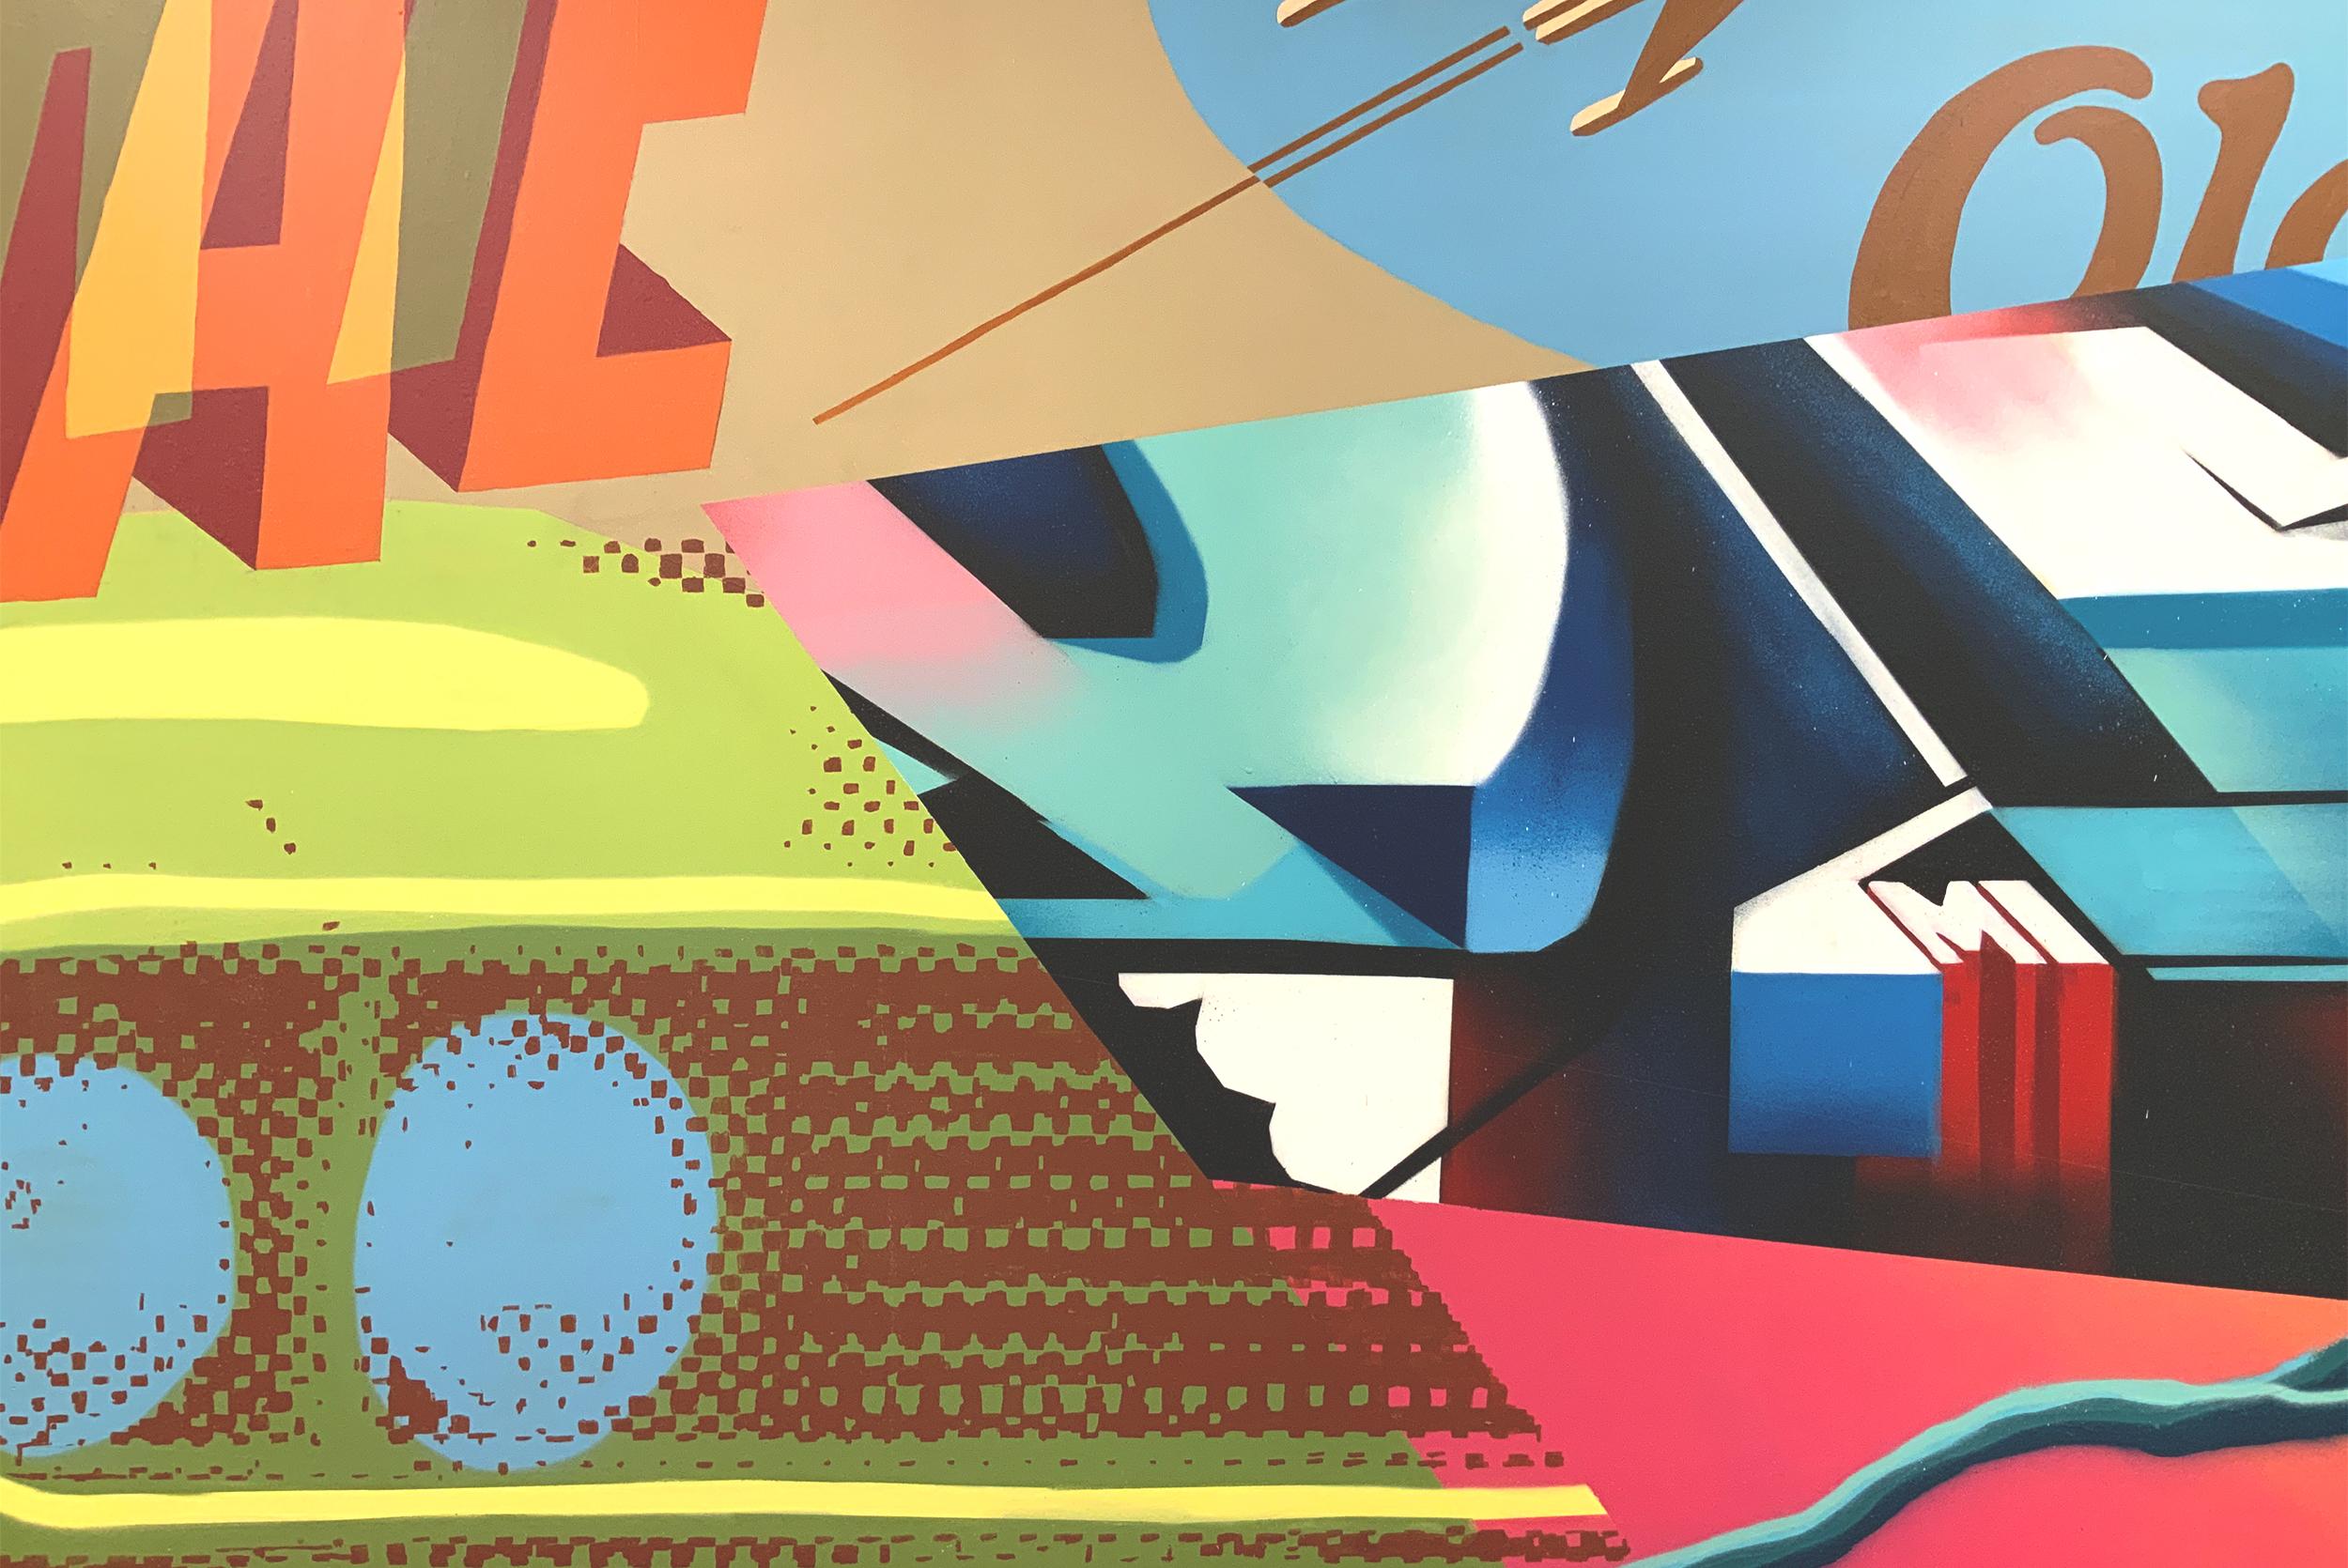 Collaborate Mural